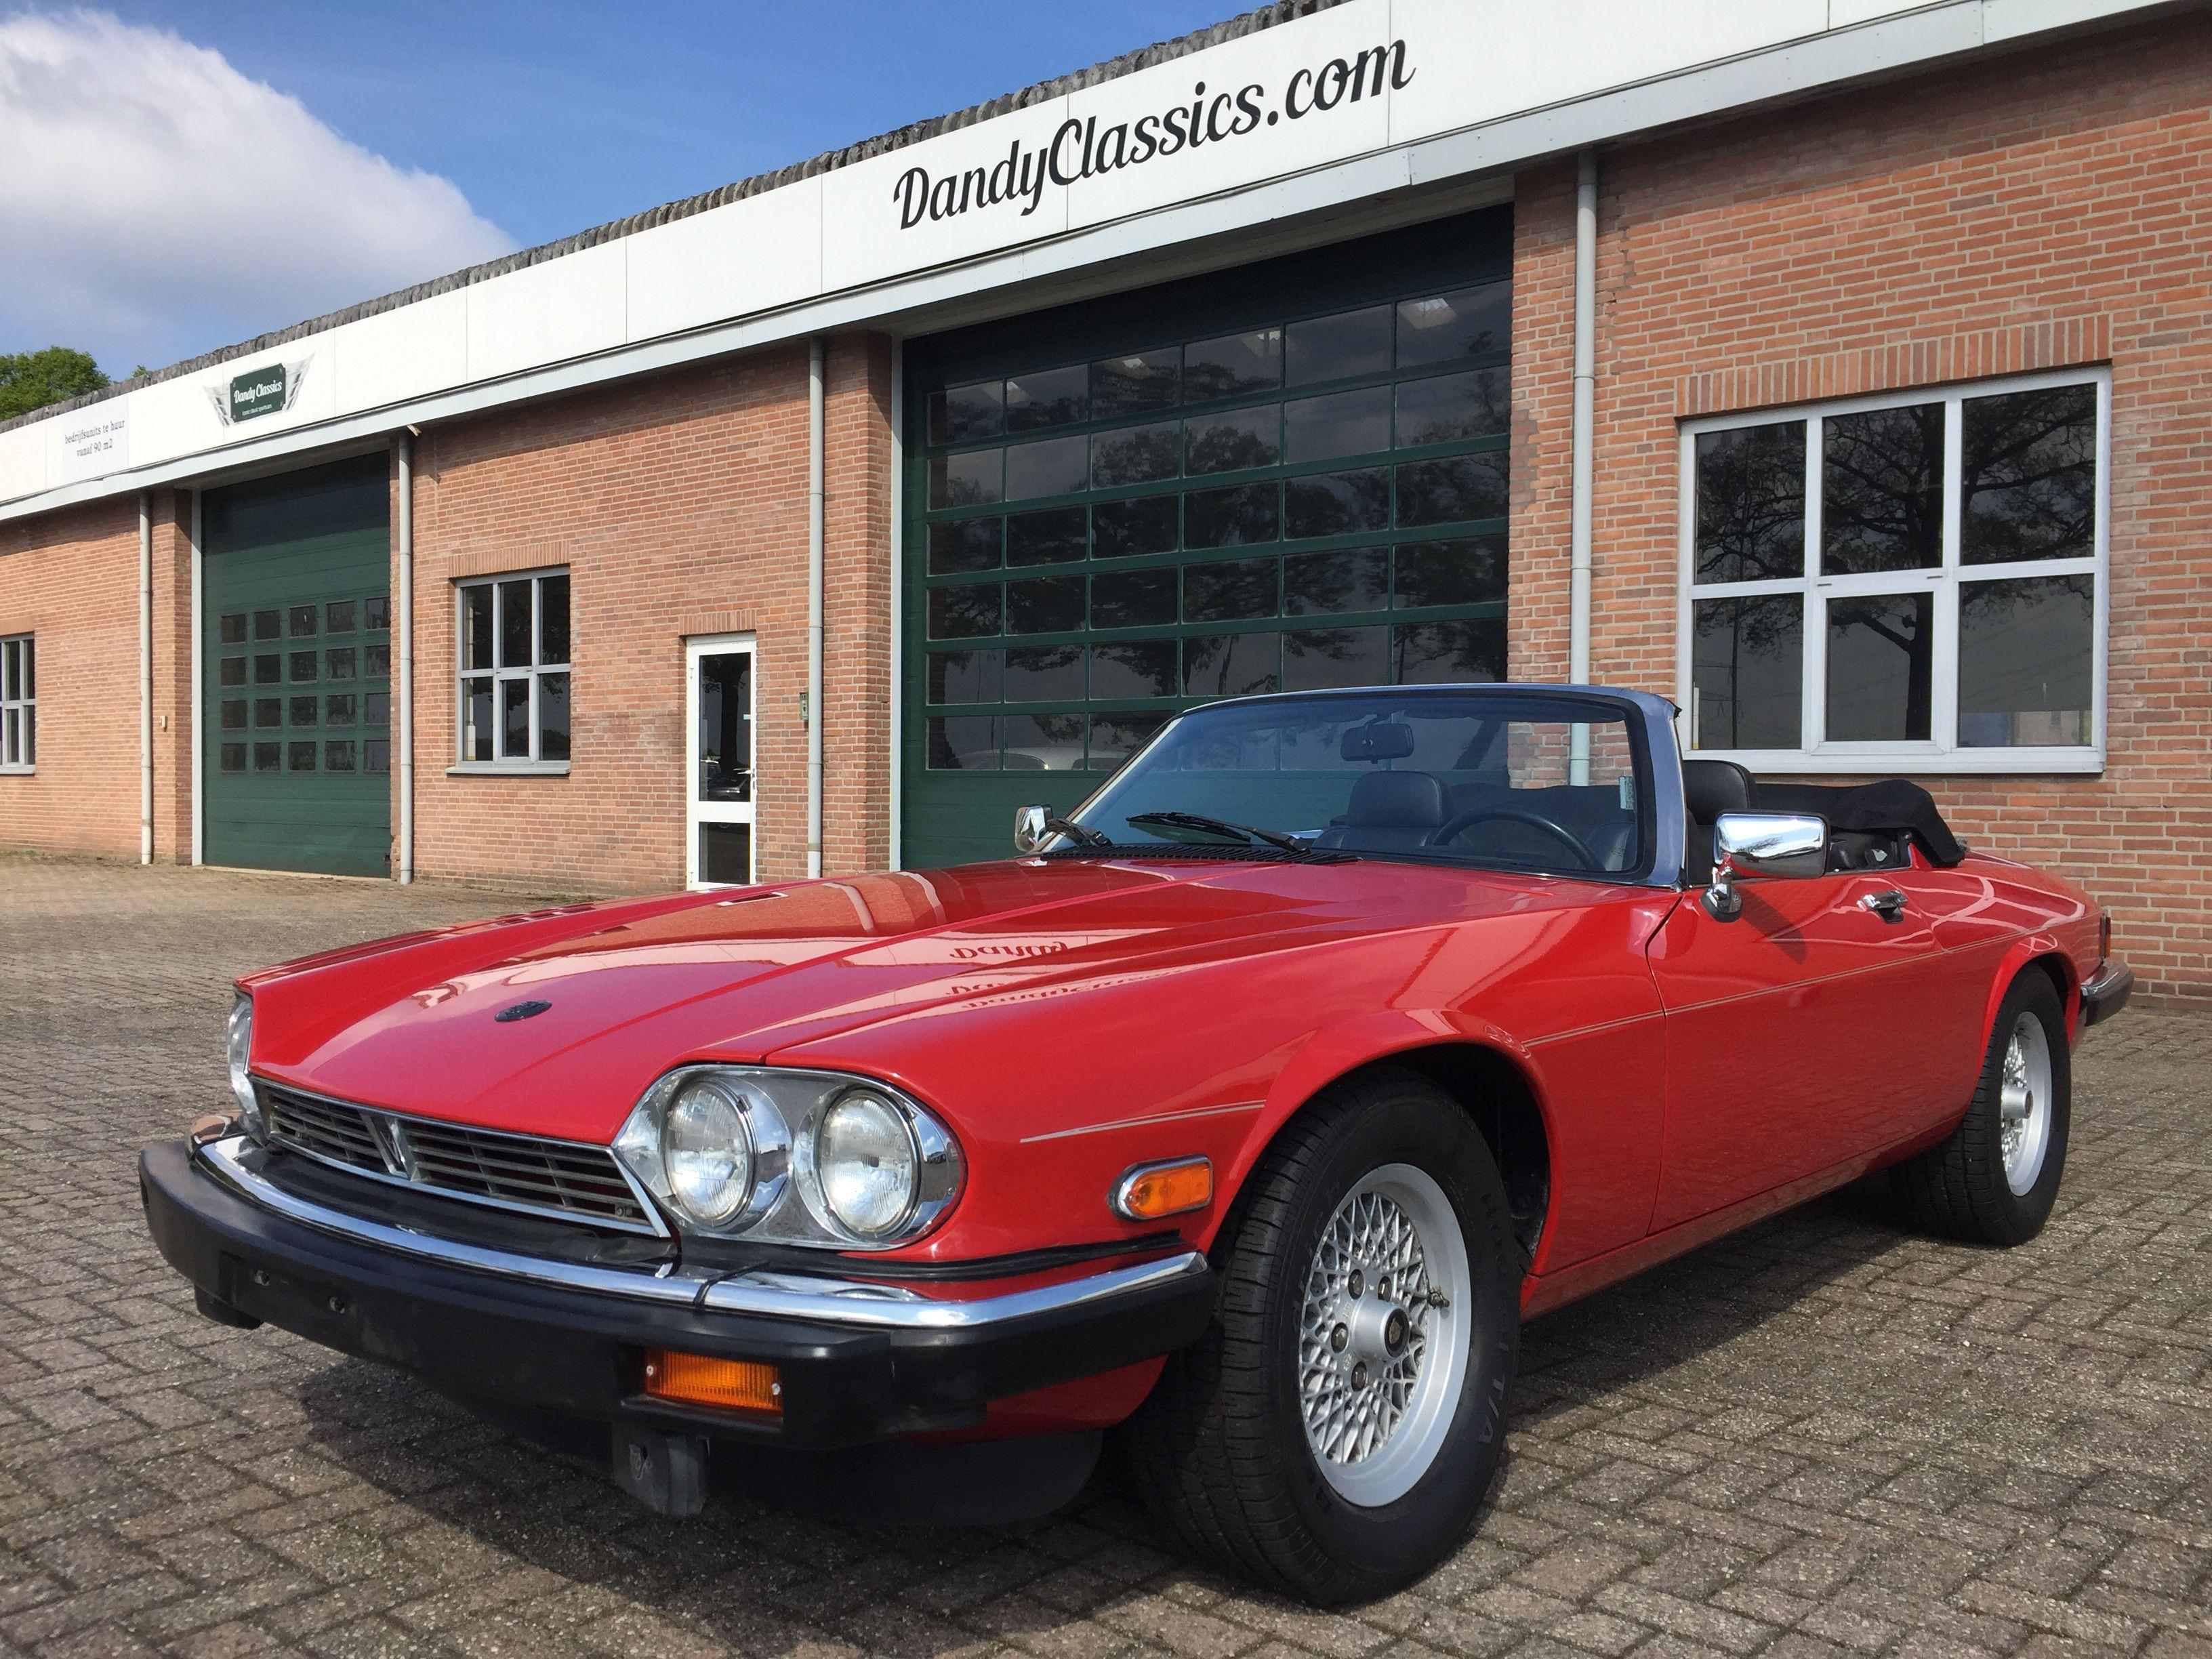 1989 Jaguar Xjs V12 Convertible For Sale Dandy Classics Jaguar Jaguar Xjs Convertible Convertible